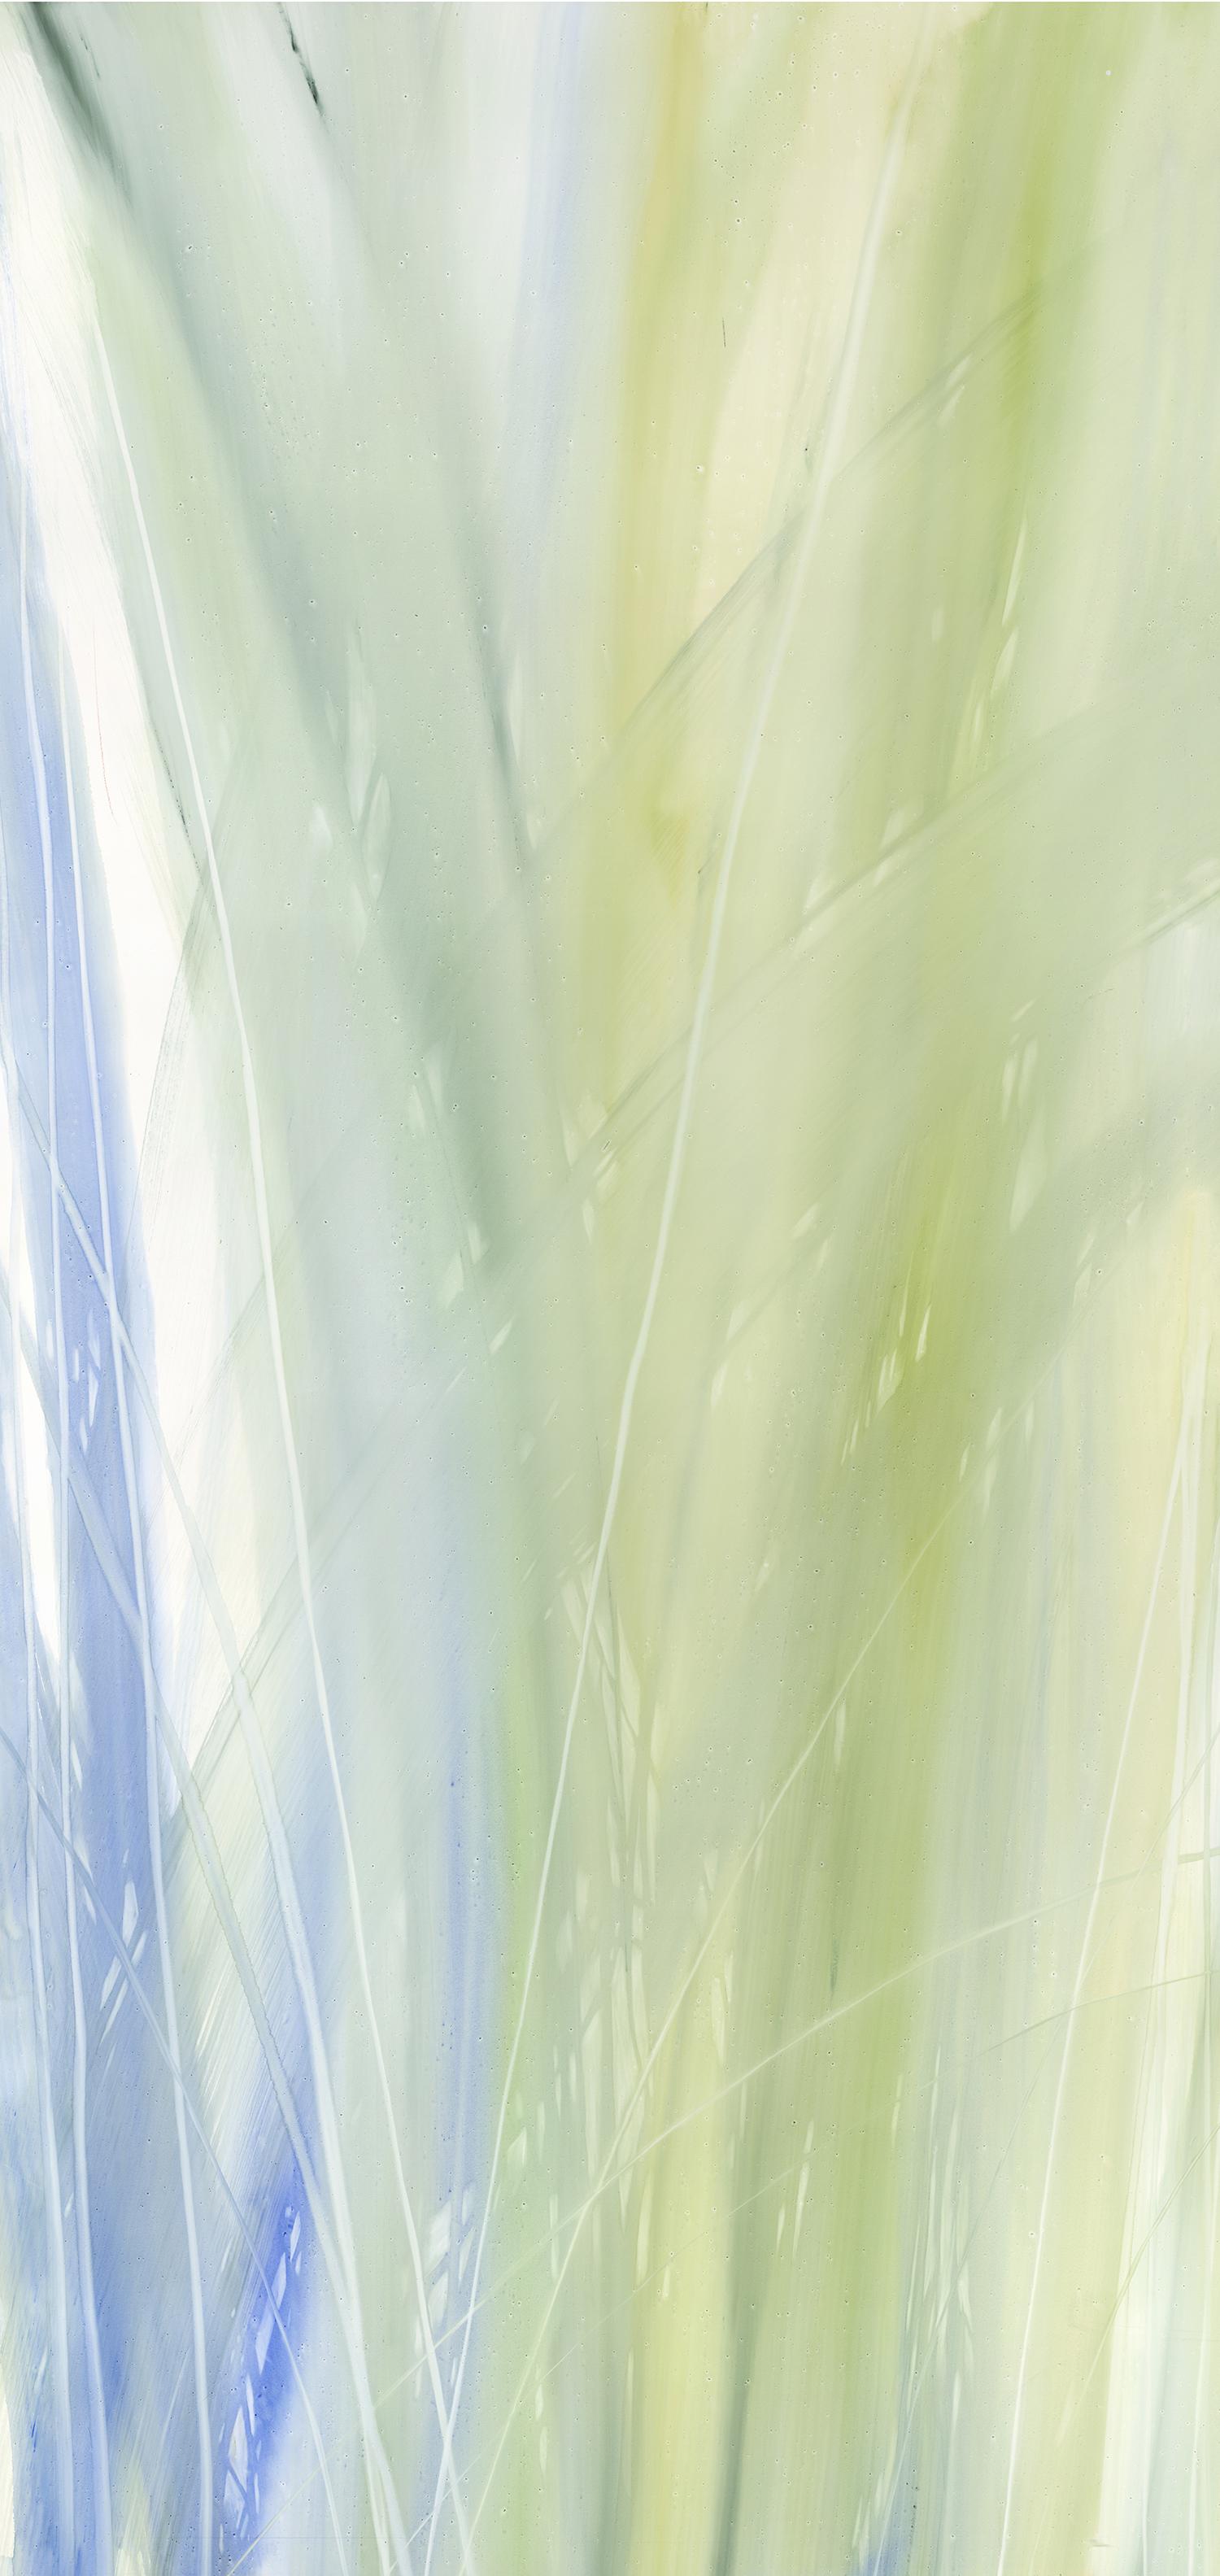 Hope and Healing_II - 96 x 48 on Aquaboard13,800.00